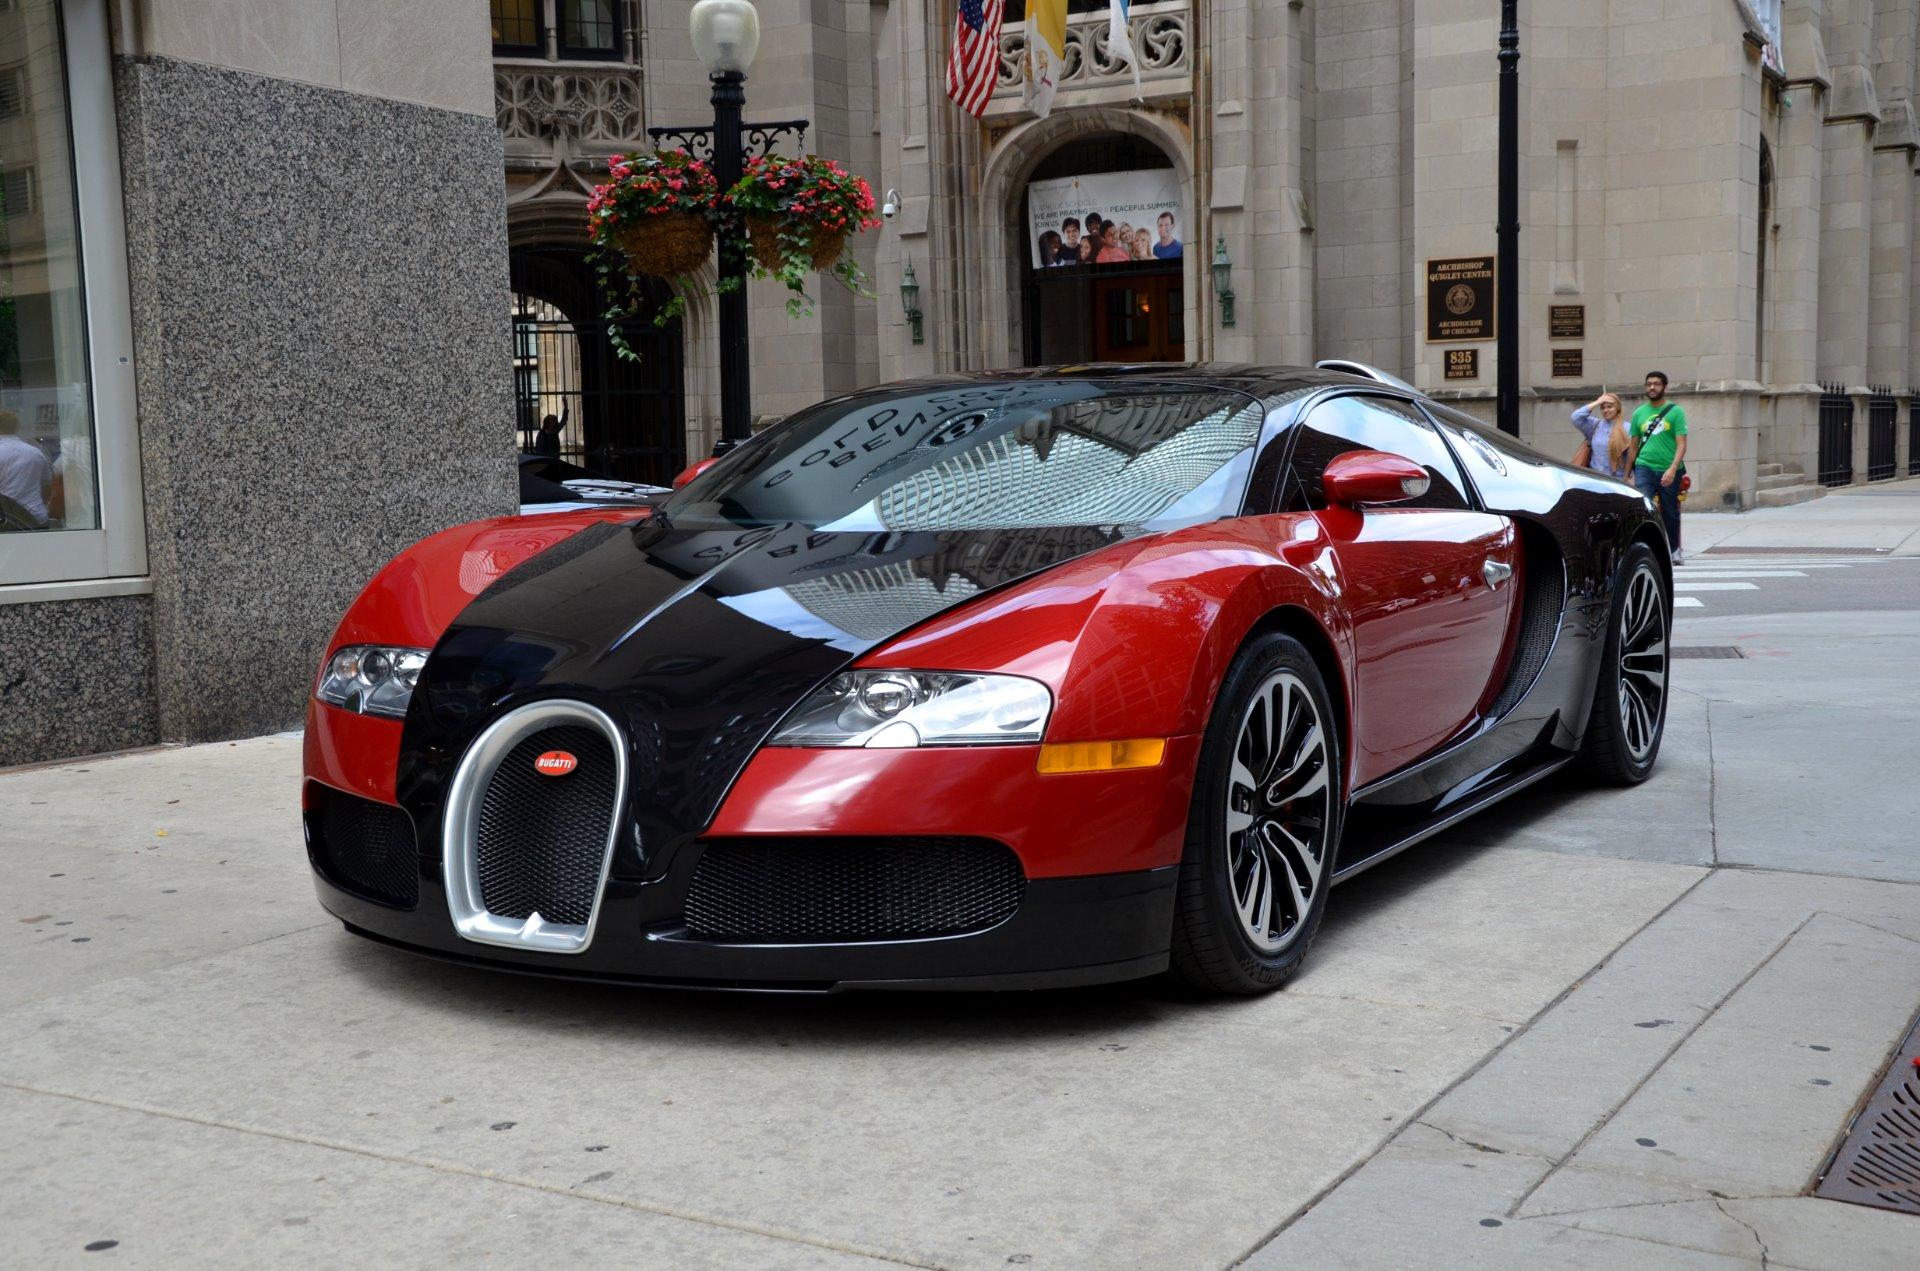 6314_p2_l Cozy Bugatti Veyron W16 Engine Price Cars Trend